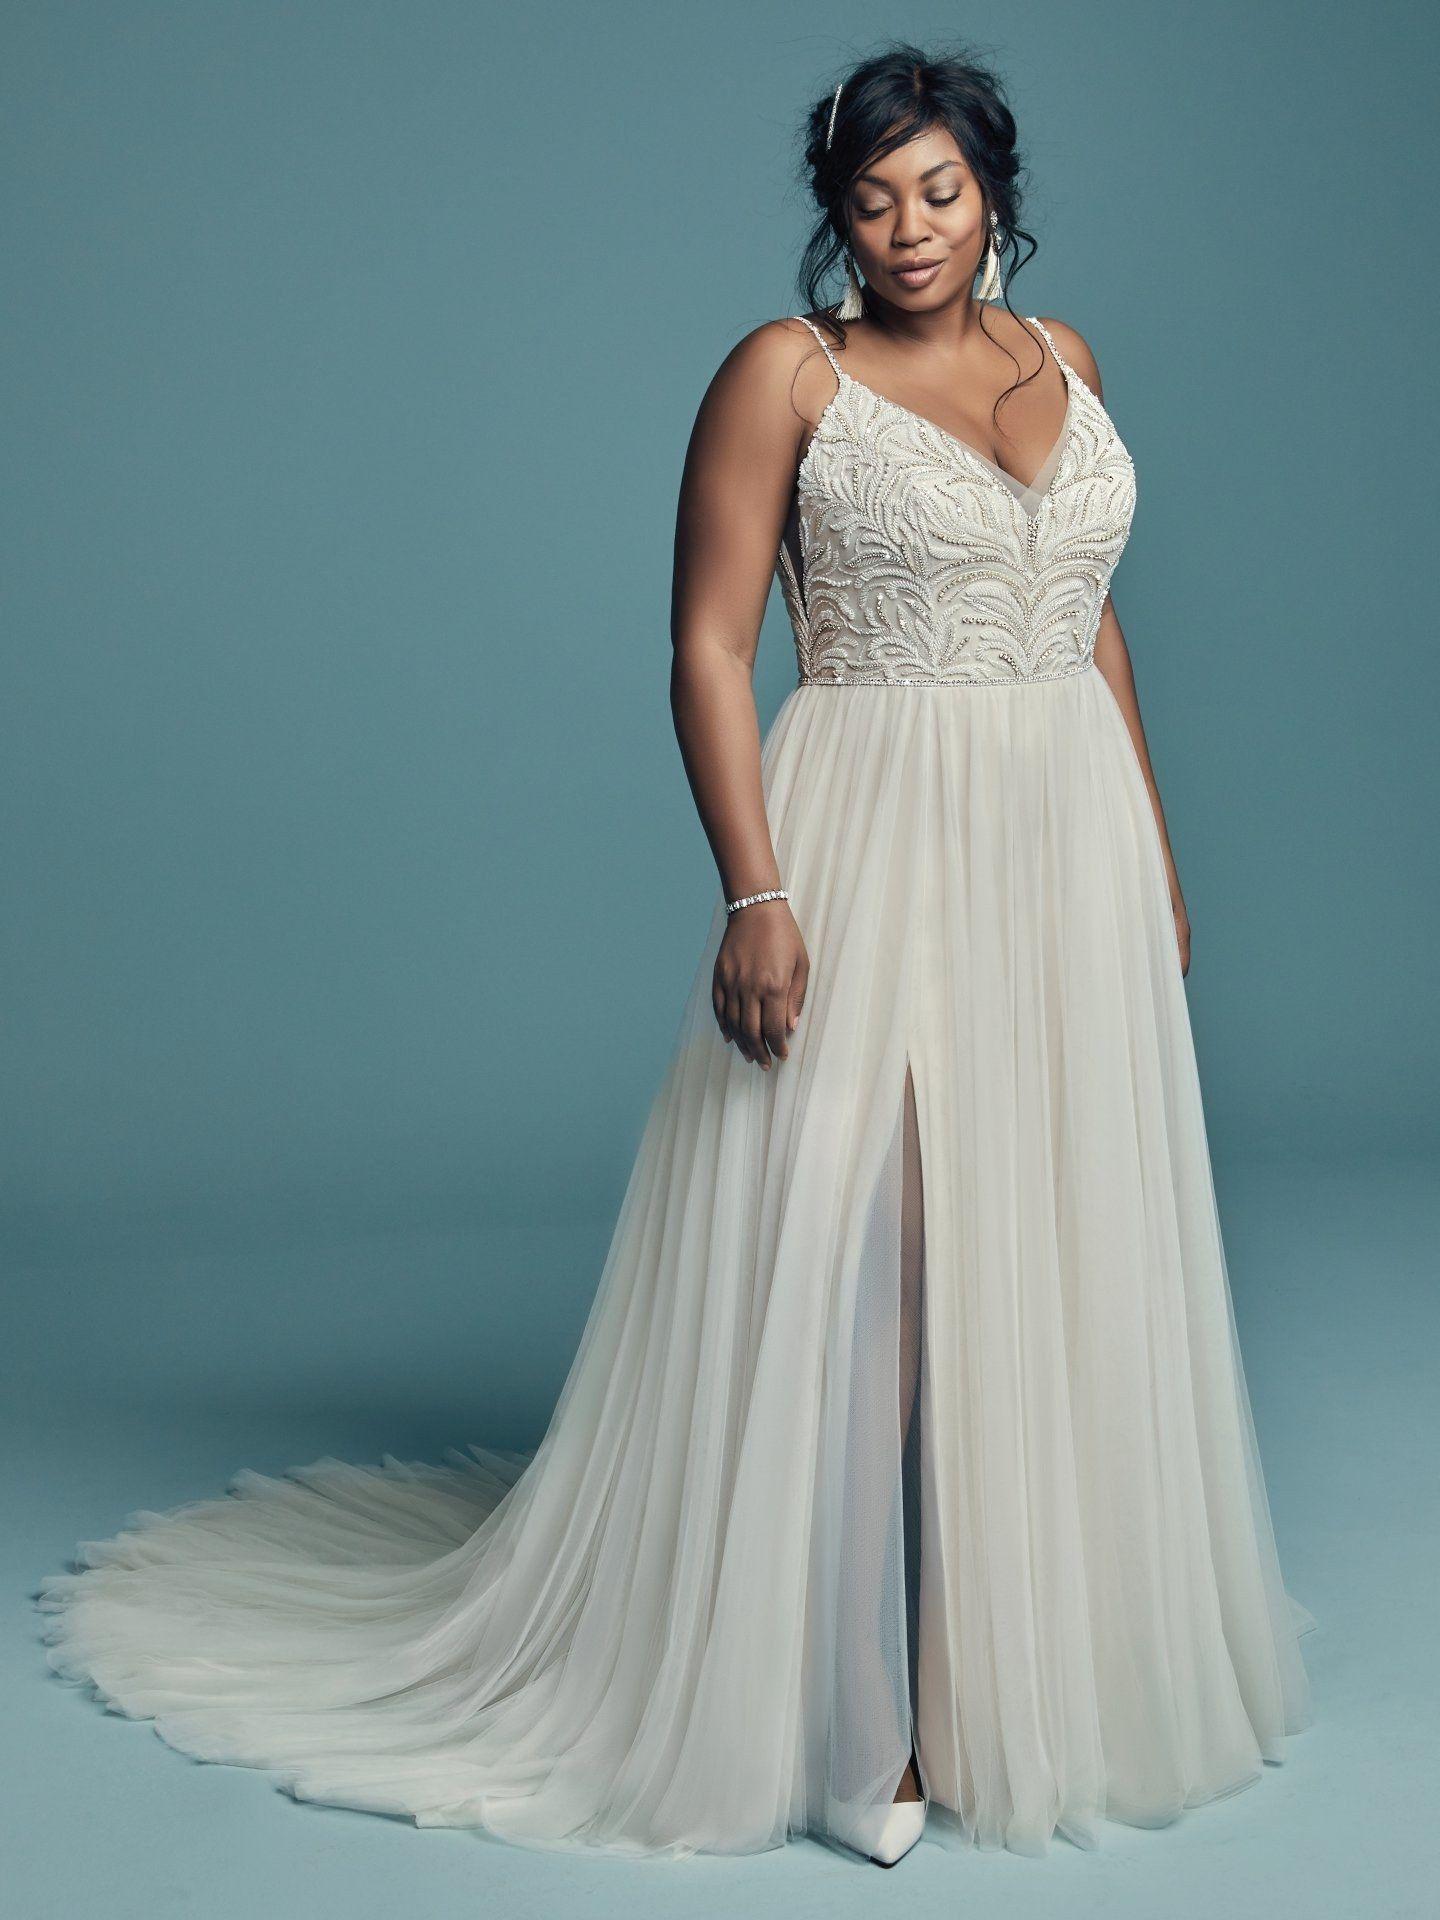 d0012c78374f 35 Designer Plus Size Wedding Dresses We Love | Brides | JG + RH in ...